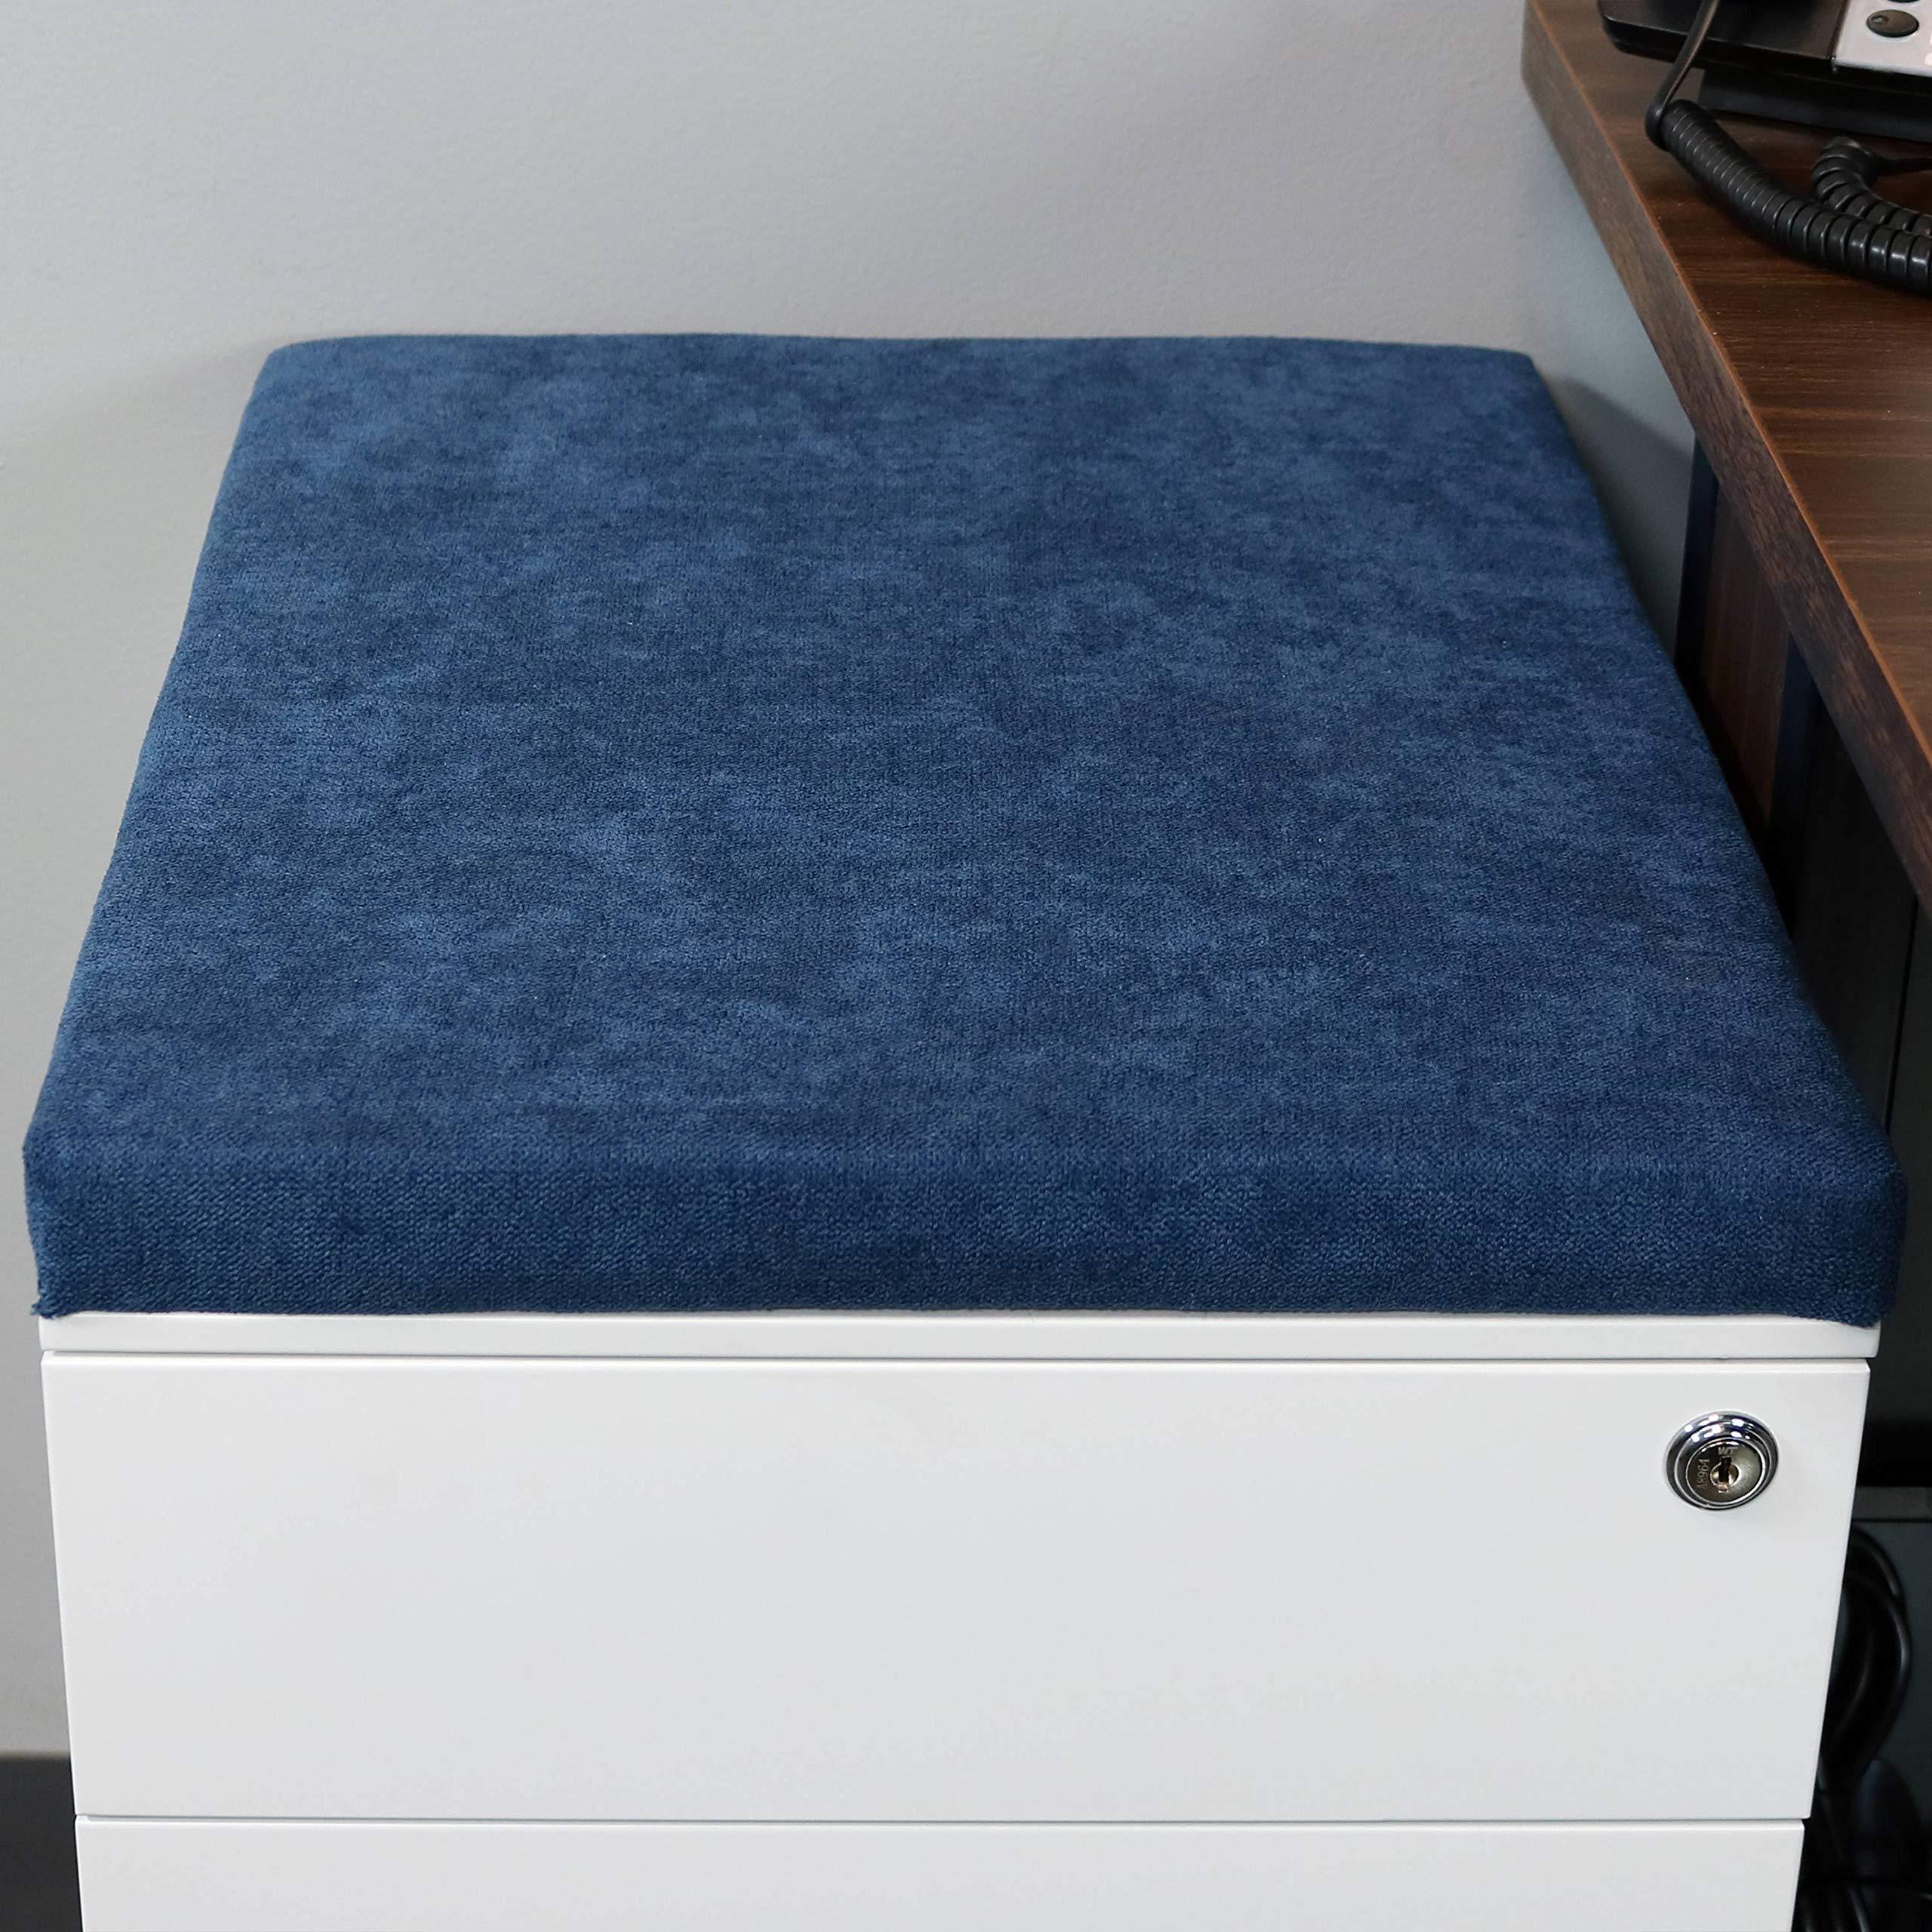 CASL Brands File Cabinet Cushion Seat Top for Mobile Pedestals, Magnetic Back, Blue by CASL Brands (Image #2)